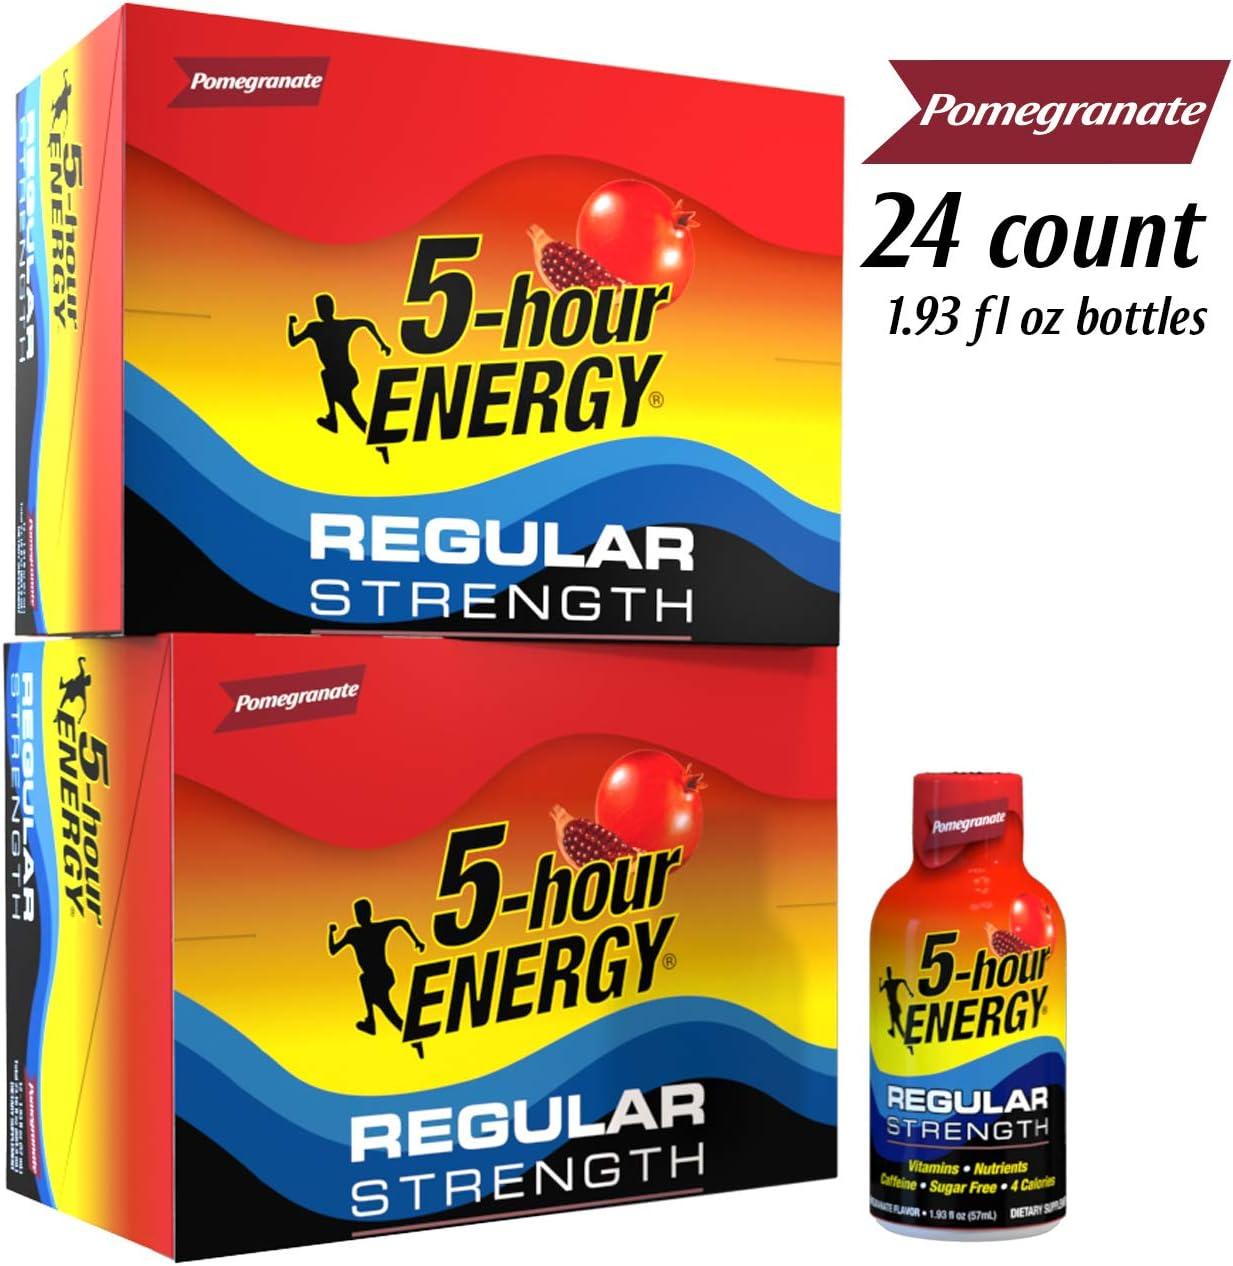 5-hour ENERGY Shot, Regular Strength, Pomegranate, 1.93 Ounce, 24 Count